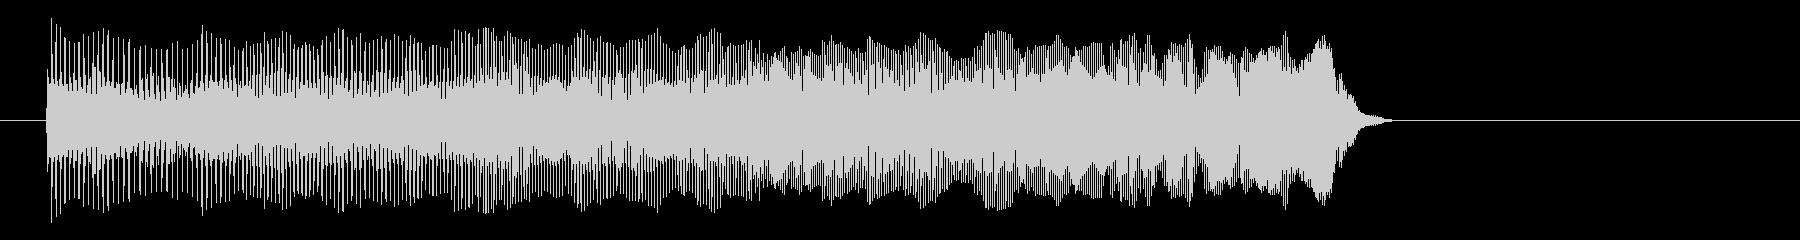 8bitパワーup-01-1_dryの未再生の波形